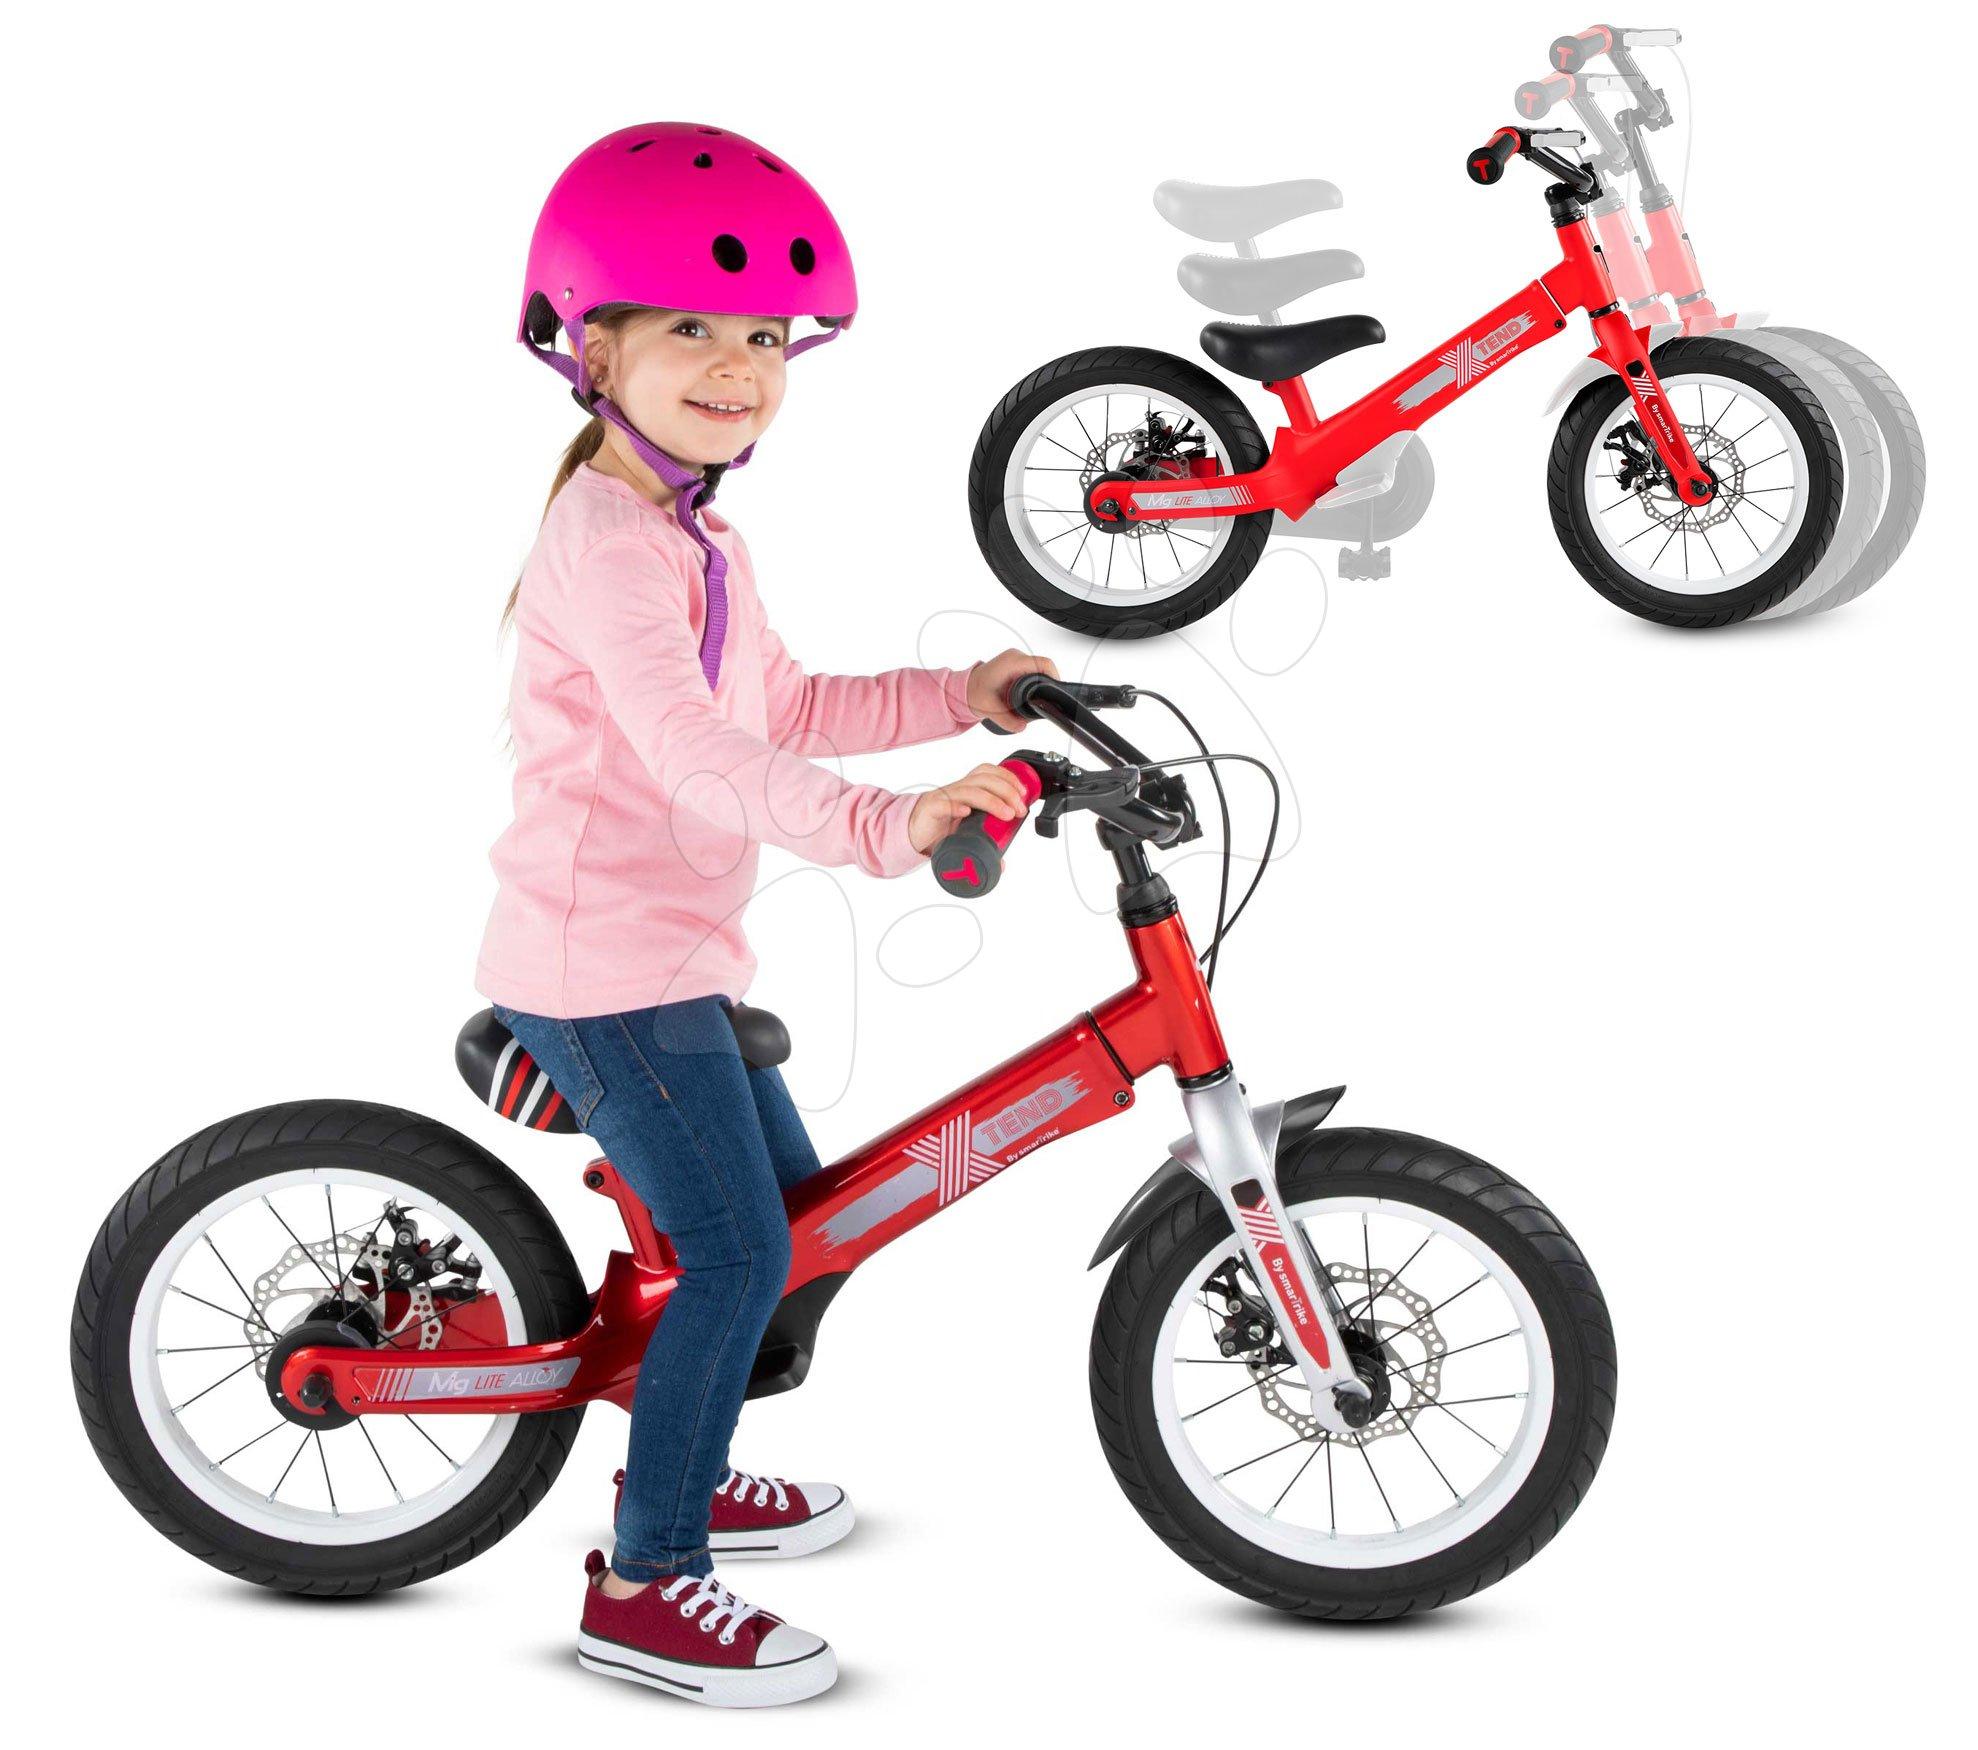 Kolo Xtend Mg+Bike Red smarTrike rozšiřitelný rám z magnézia a 2 kotoučové brzdy od 3–7 let